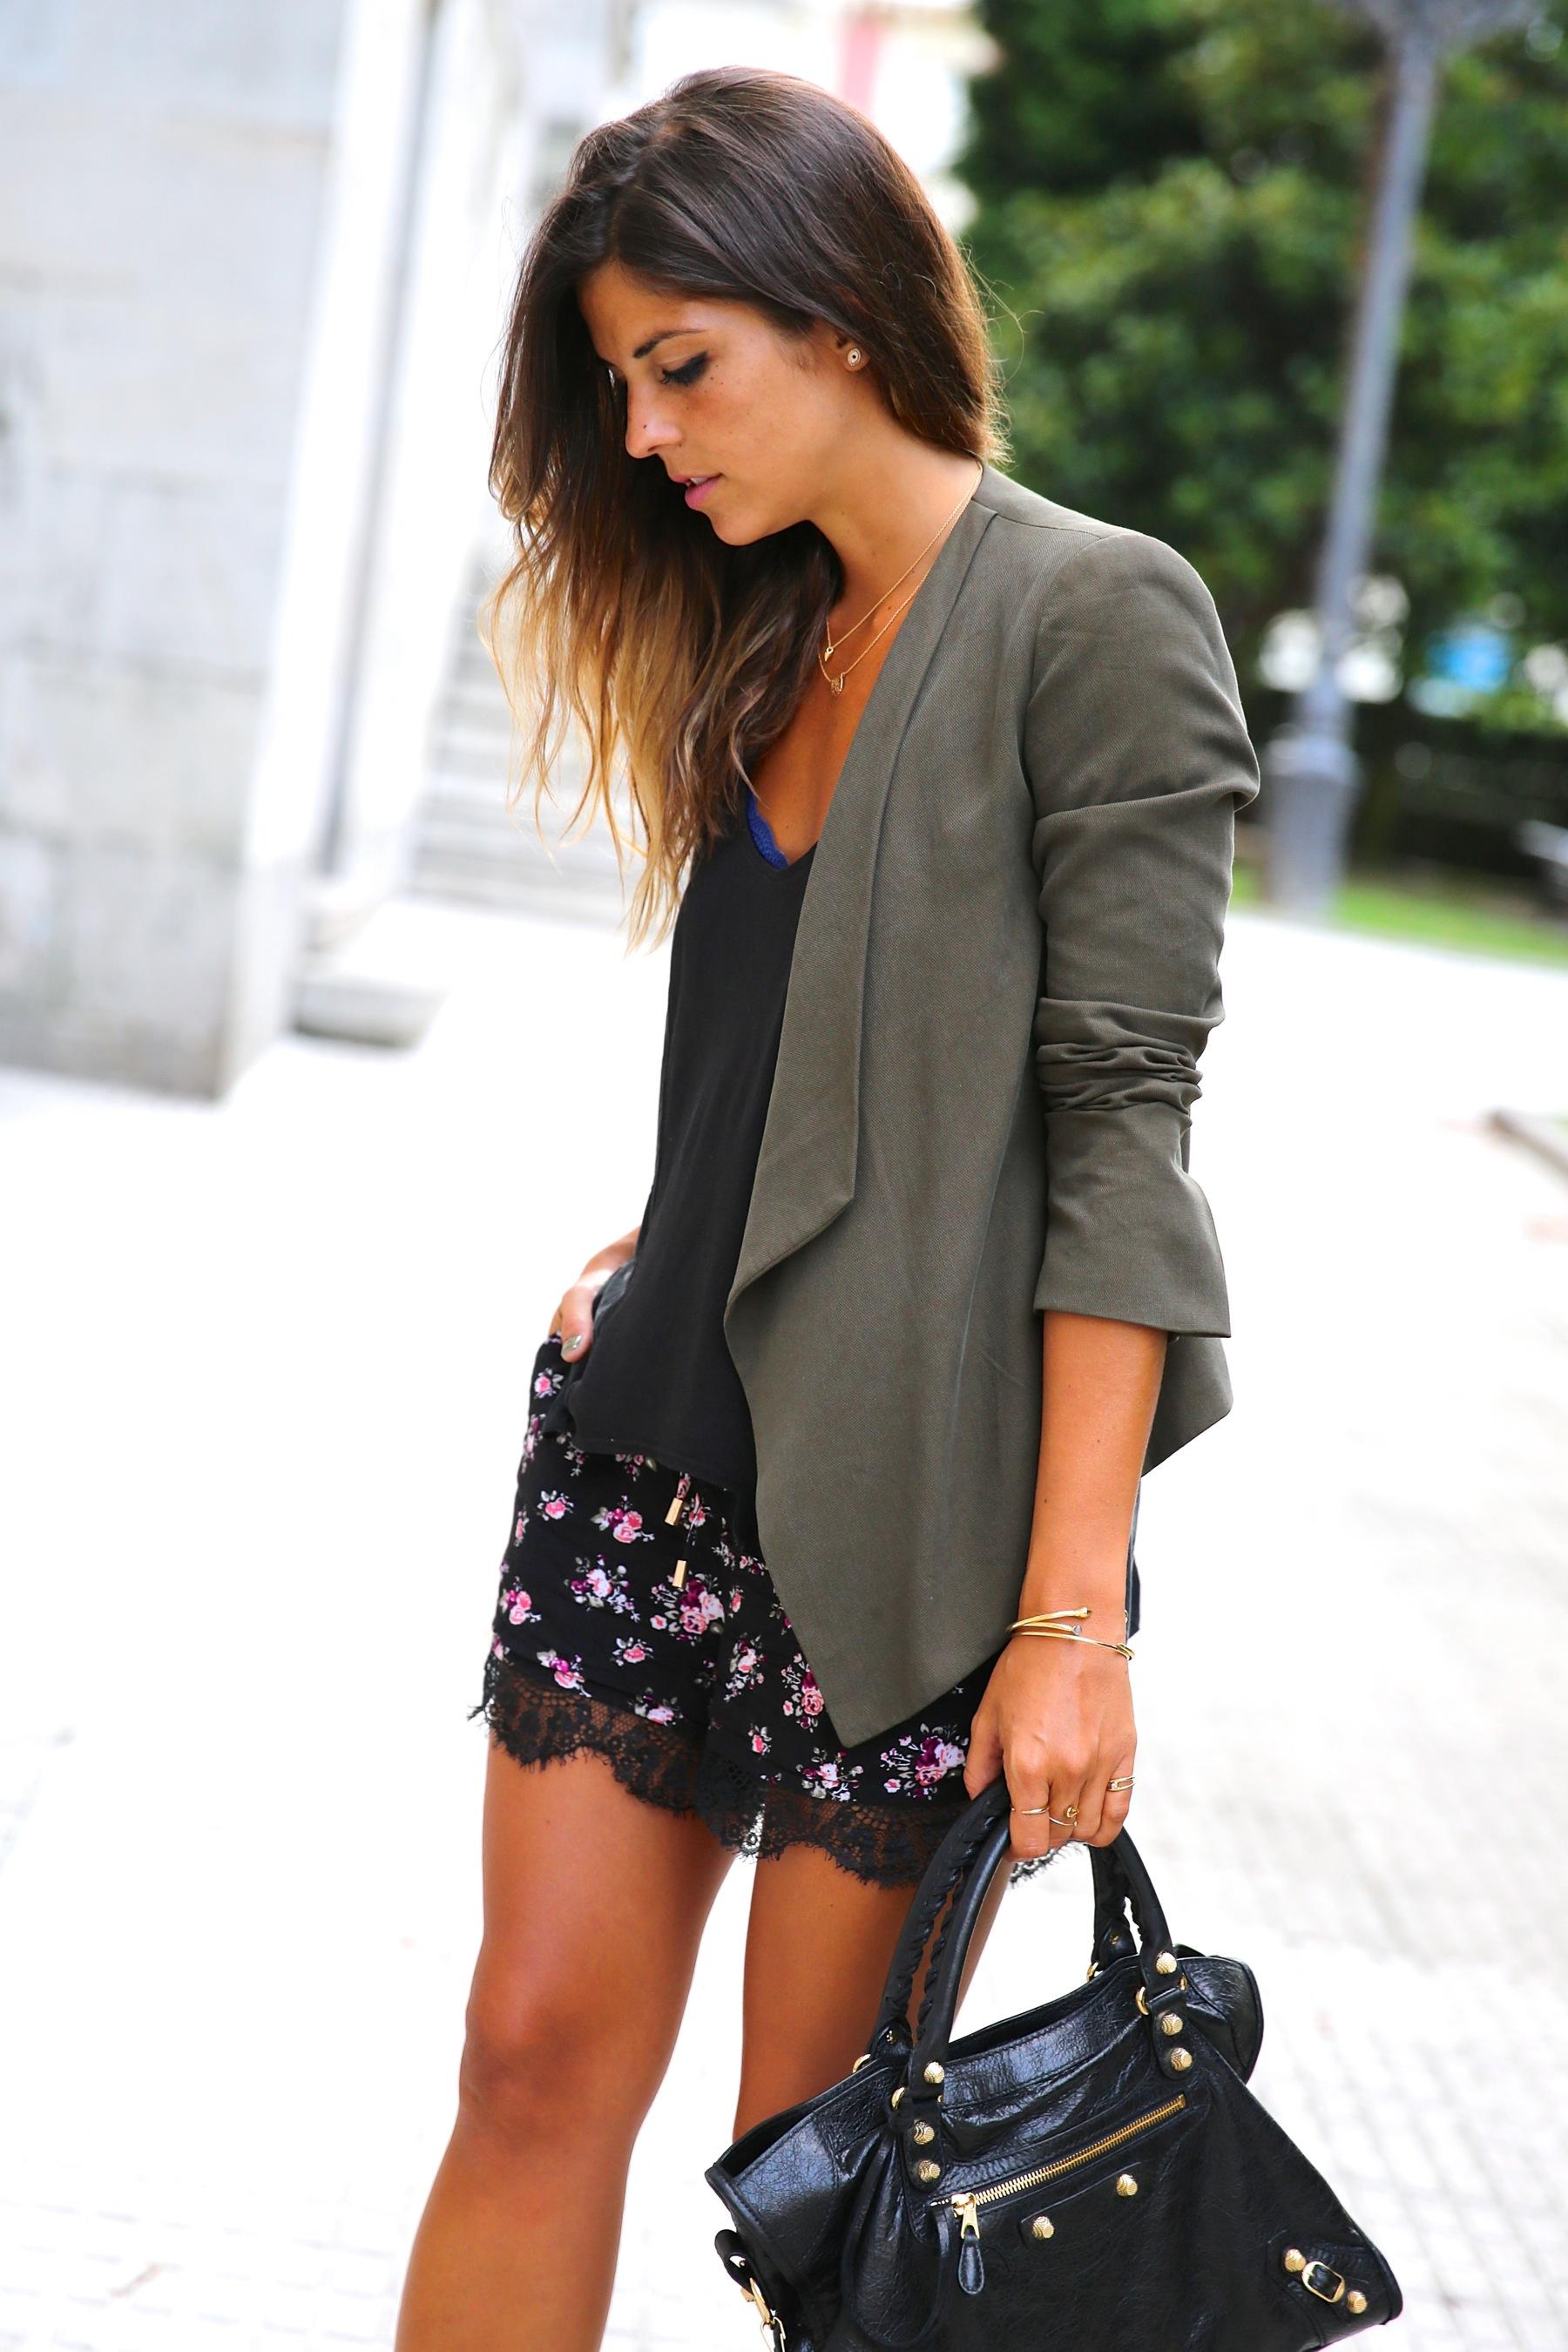 trendy_taste-look-outfit-street_style-ootd-blog-blogger-fashion_spain-moda_españa-khaki_blazer-blazer_caqui-flower_print-estampado_flores-shorts-botines_charol-7